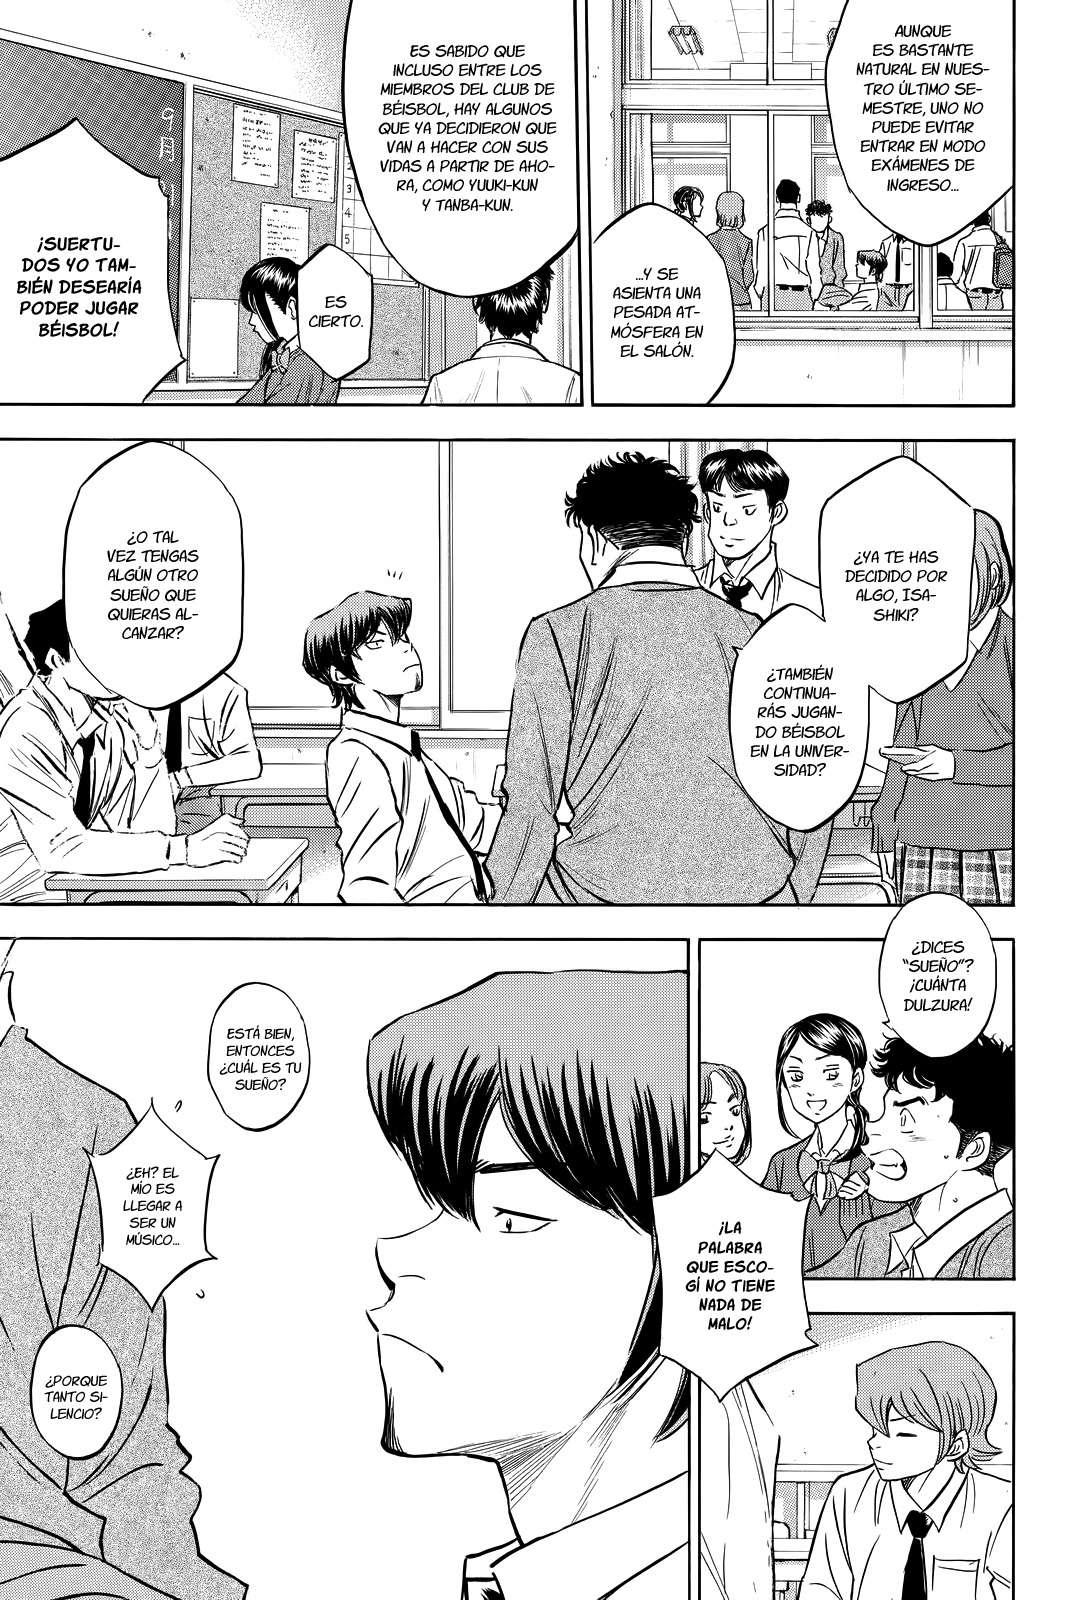 http://c5.ninemanga.com/es_manga/24/1752/422720/95a56499dd2770f5b9093770d7085266.jpg Page 6